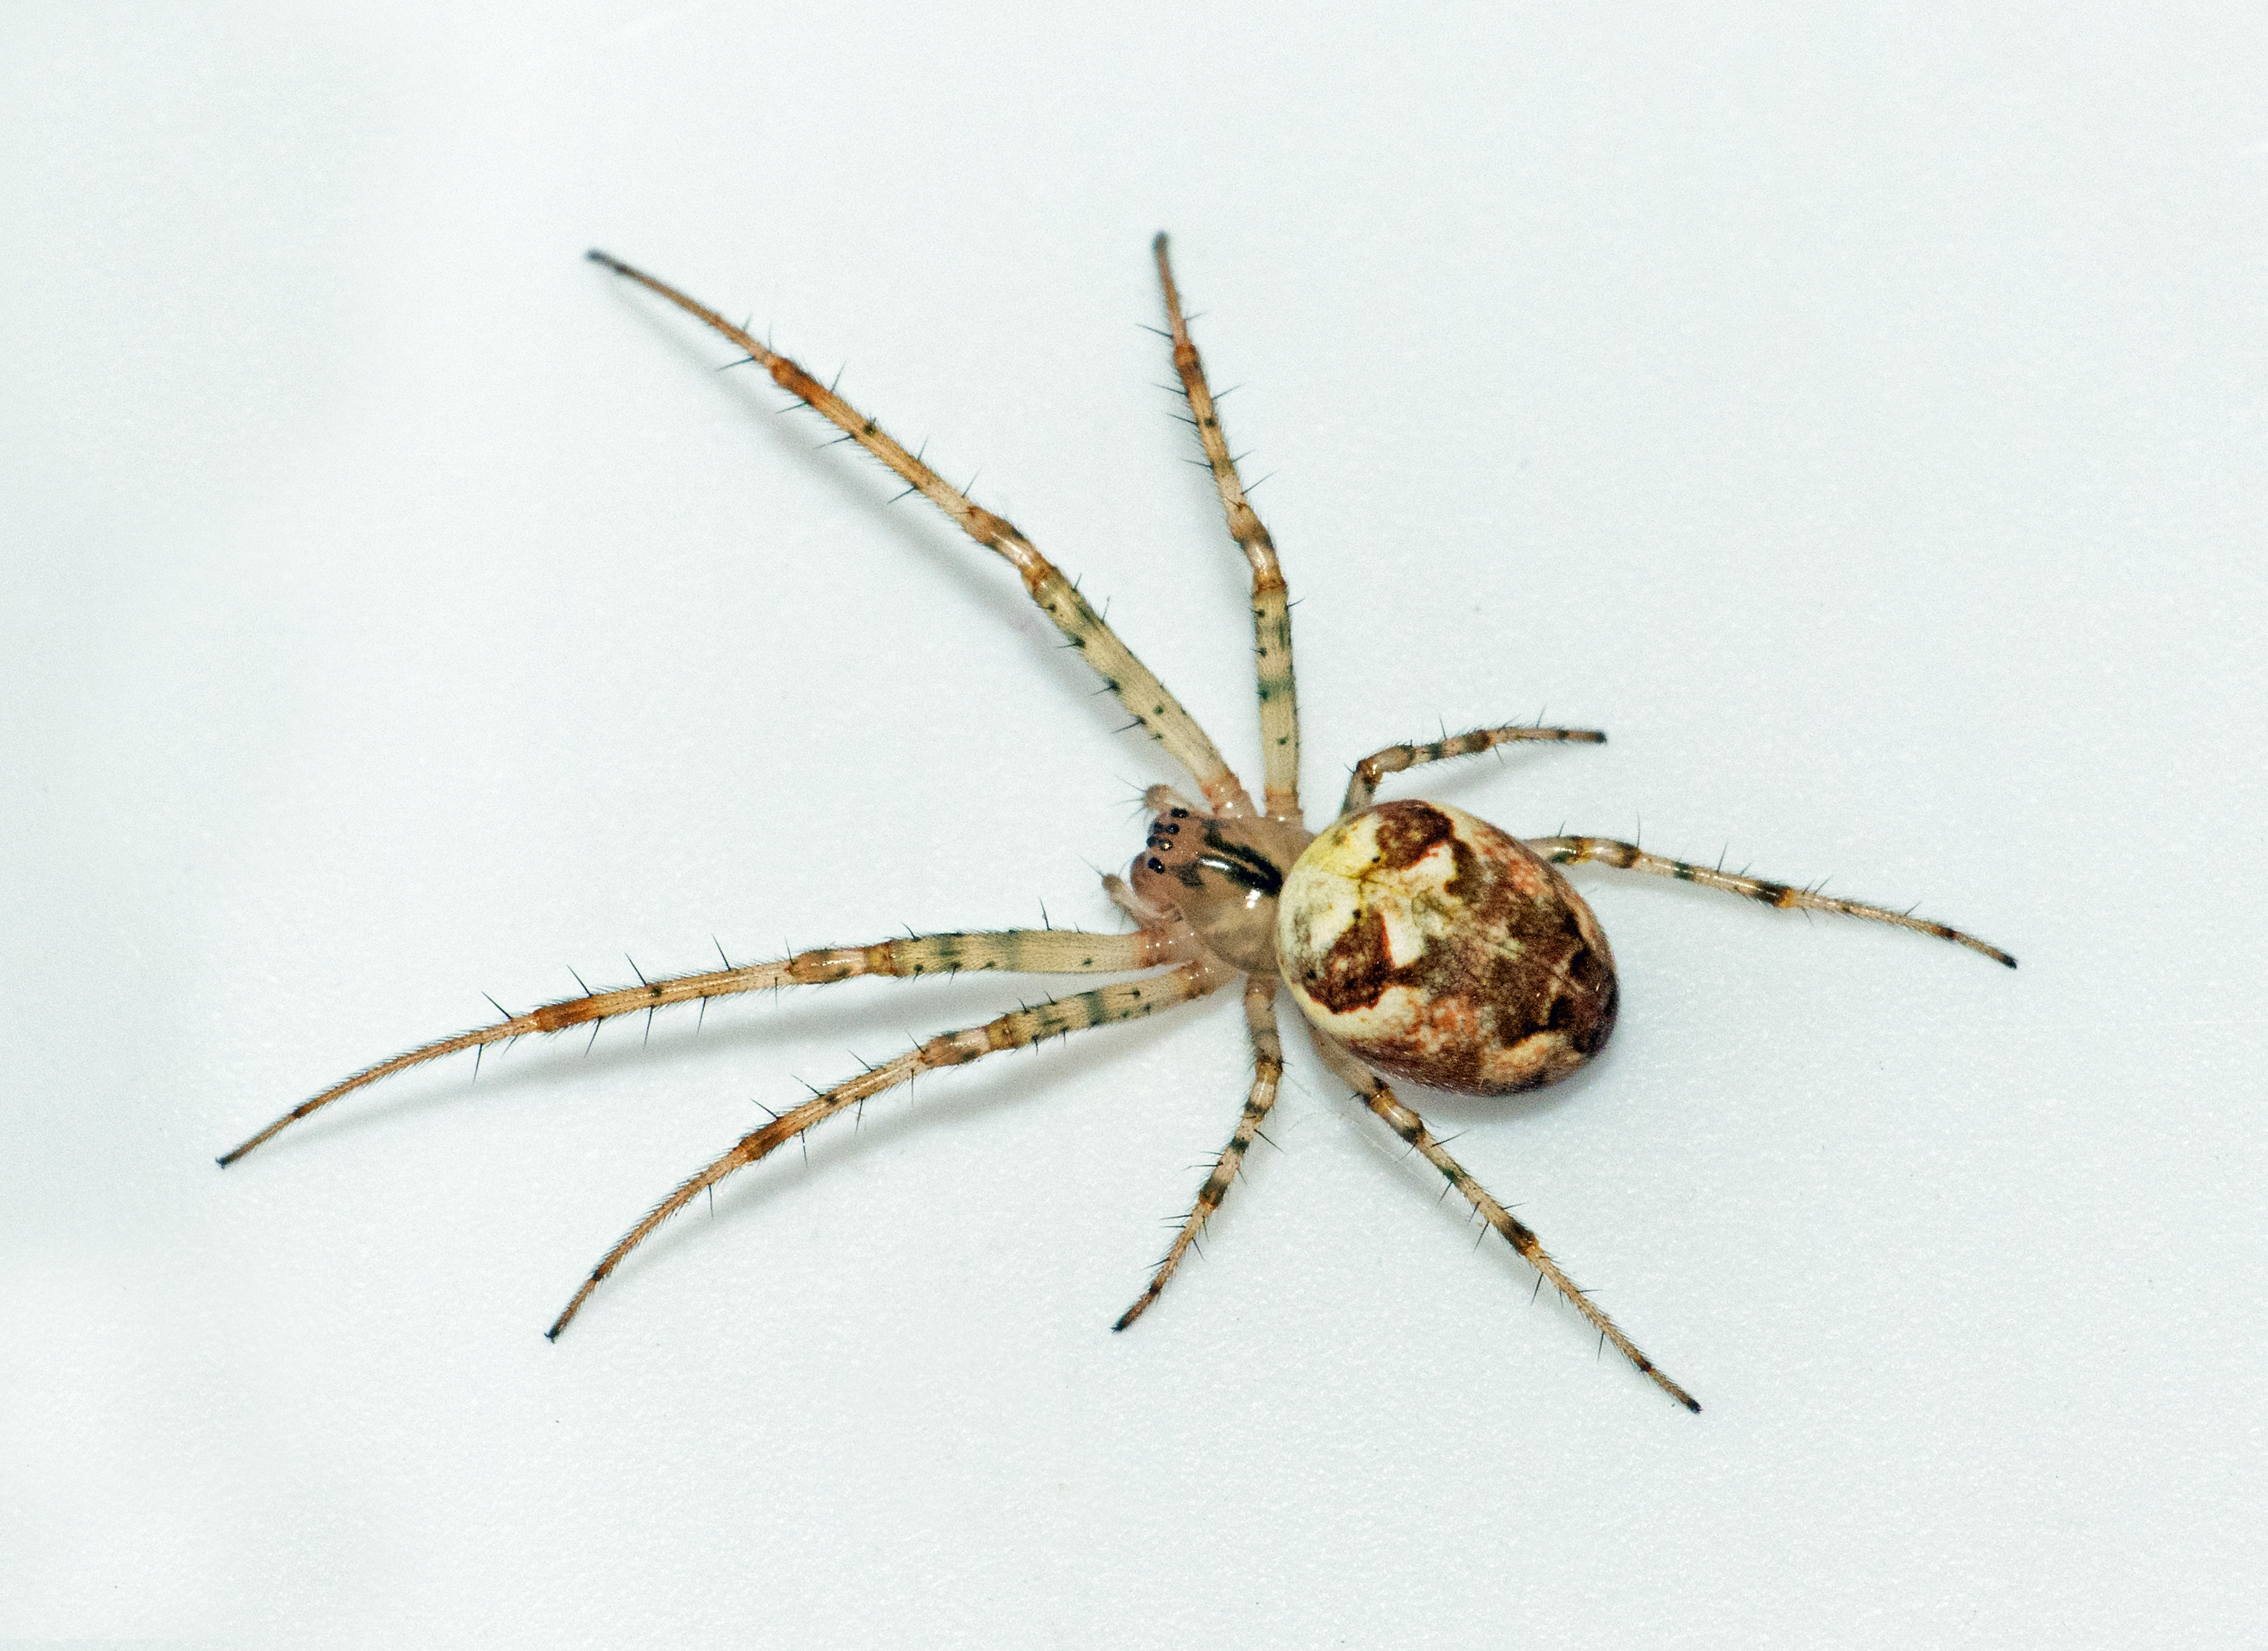 Picture of Metellina segmentata - Female - Dorsal